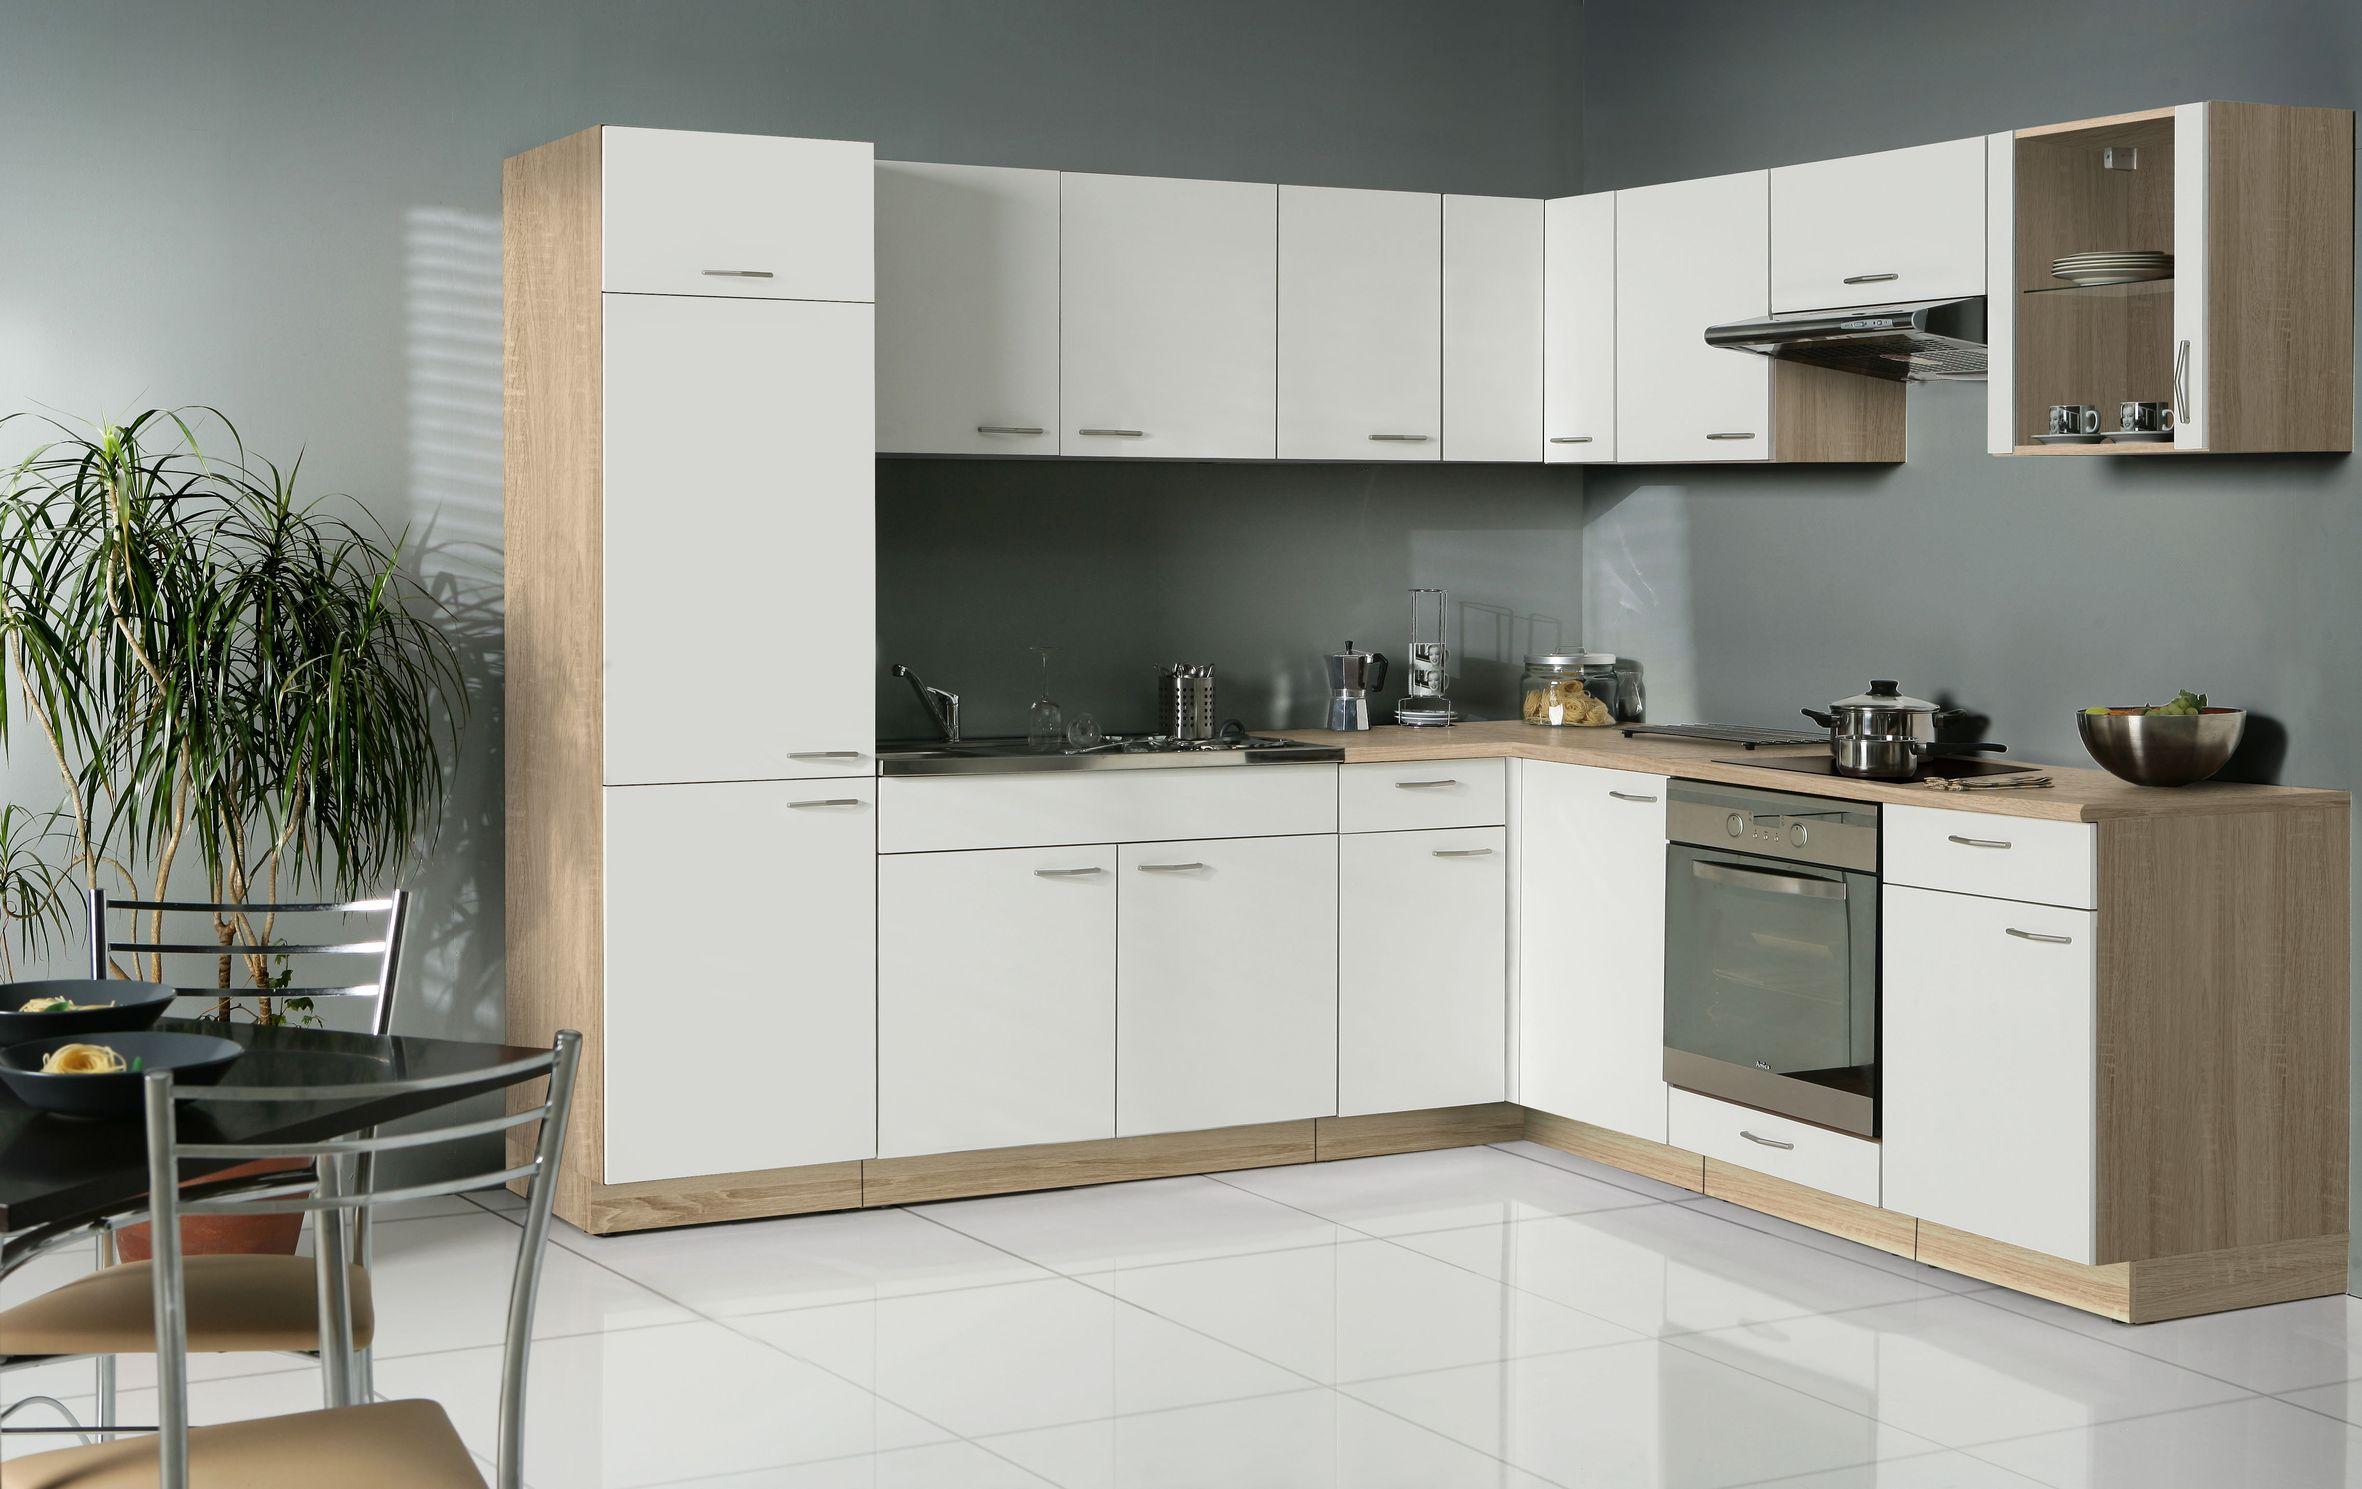 einbauk che kombination classico 11 tlg k chenm bel l k che. Black Bedroom Furniture Sets. Home Design Ideas